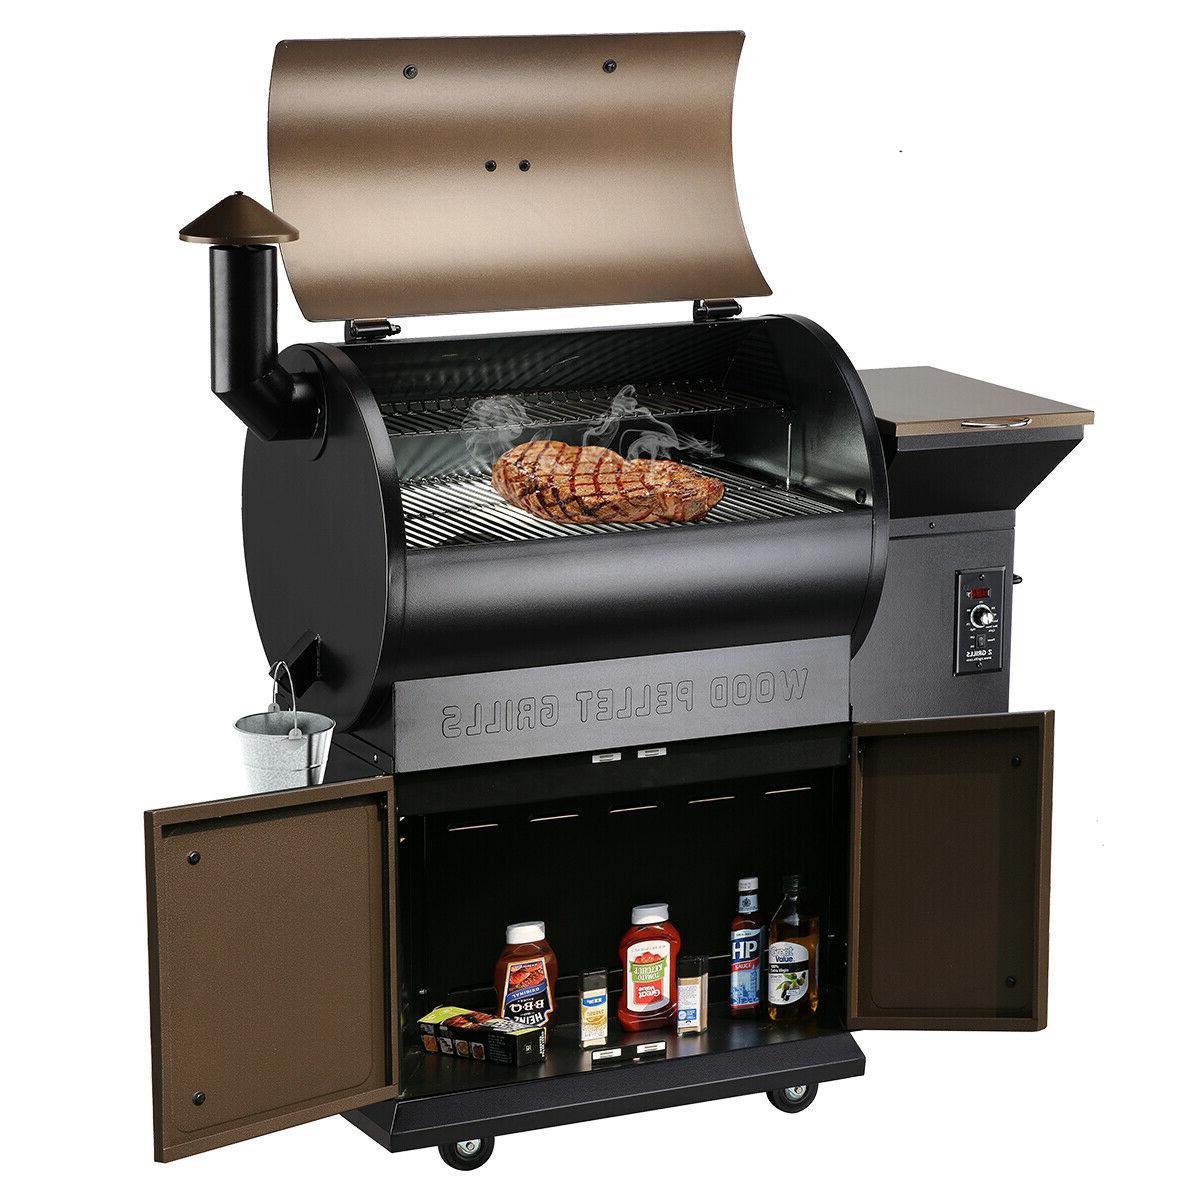 Z GRILLS ZPG-700D Wood Pellet Grill BBQ Smoker